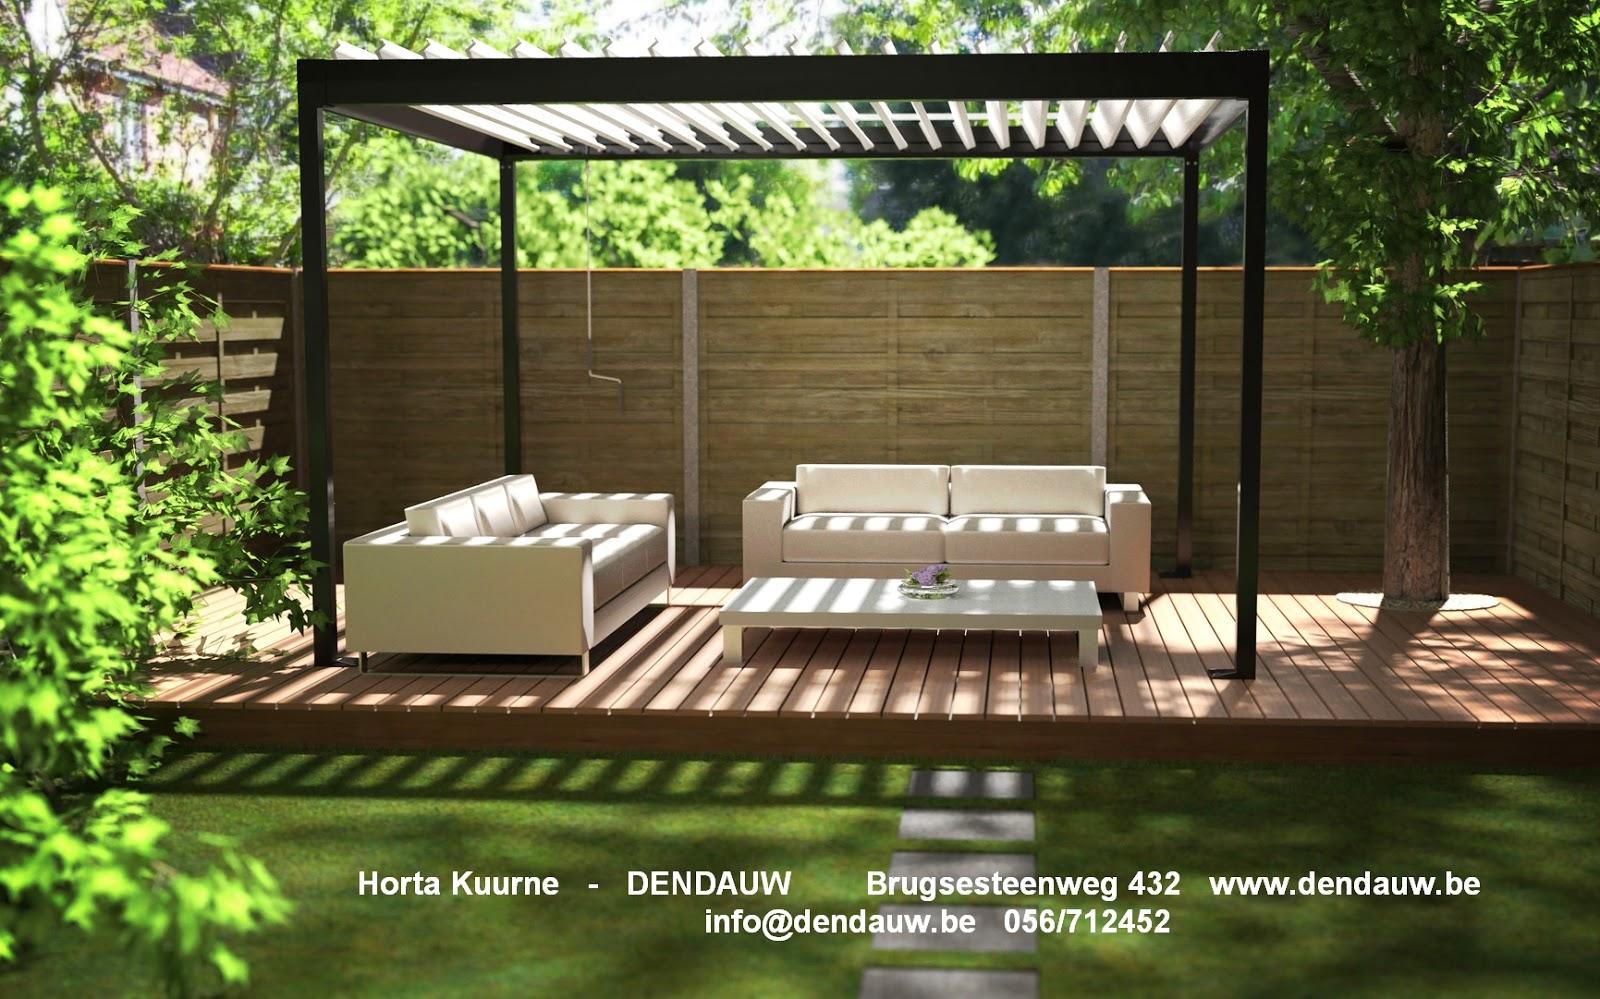 Horta dendauw kuurne vrijstaande pergola in aluminium met roteerbare daklamellen azore - Pergola met intrekbaar canvas ...